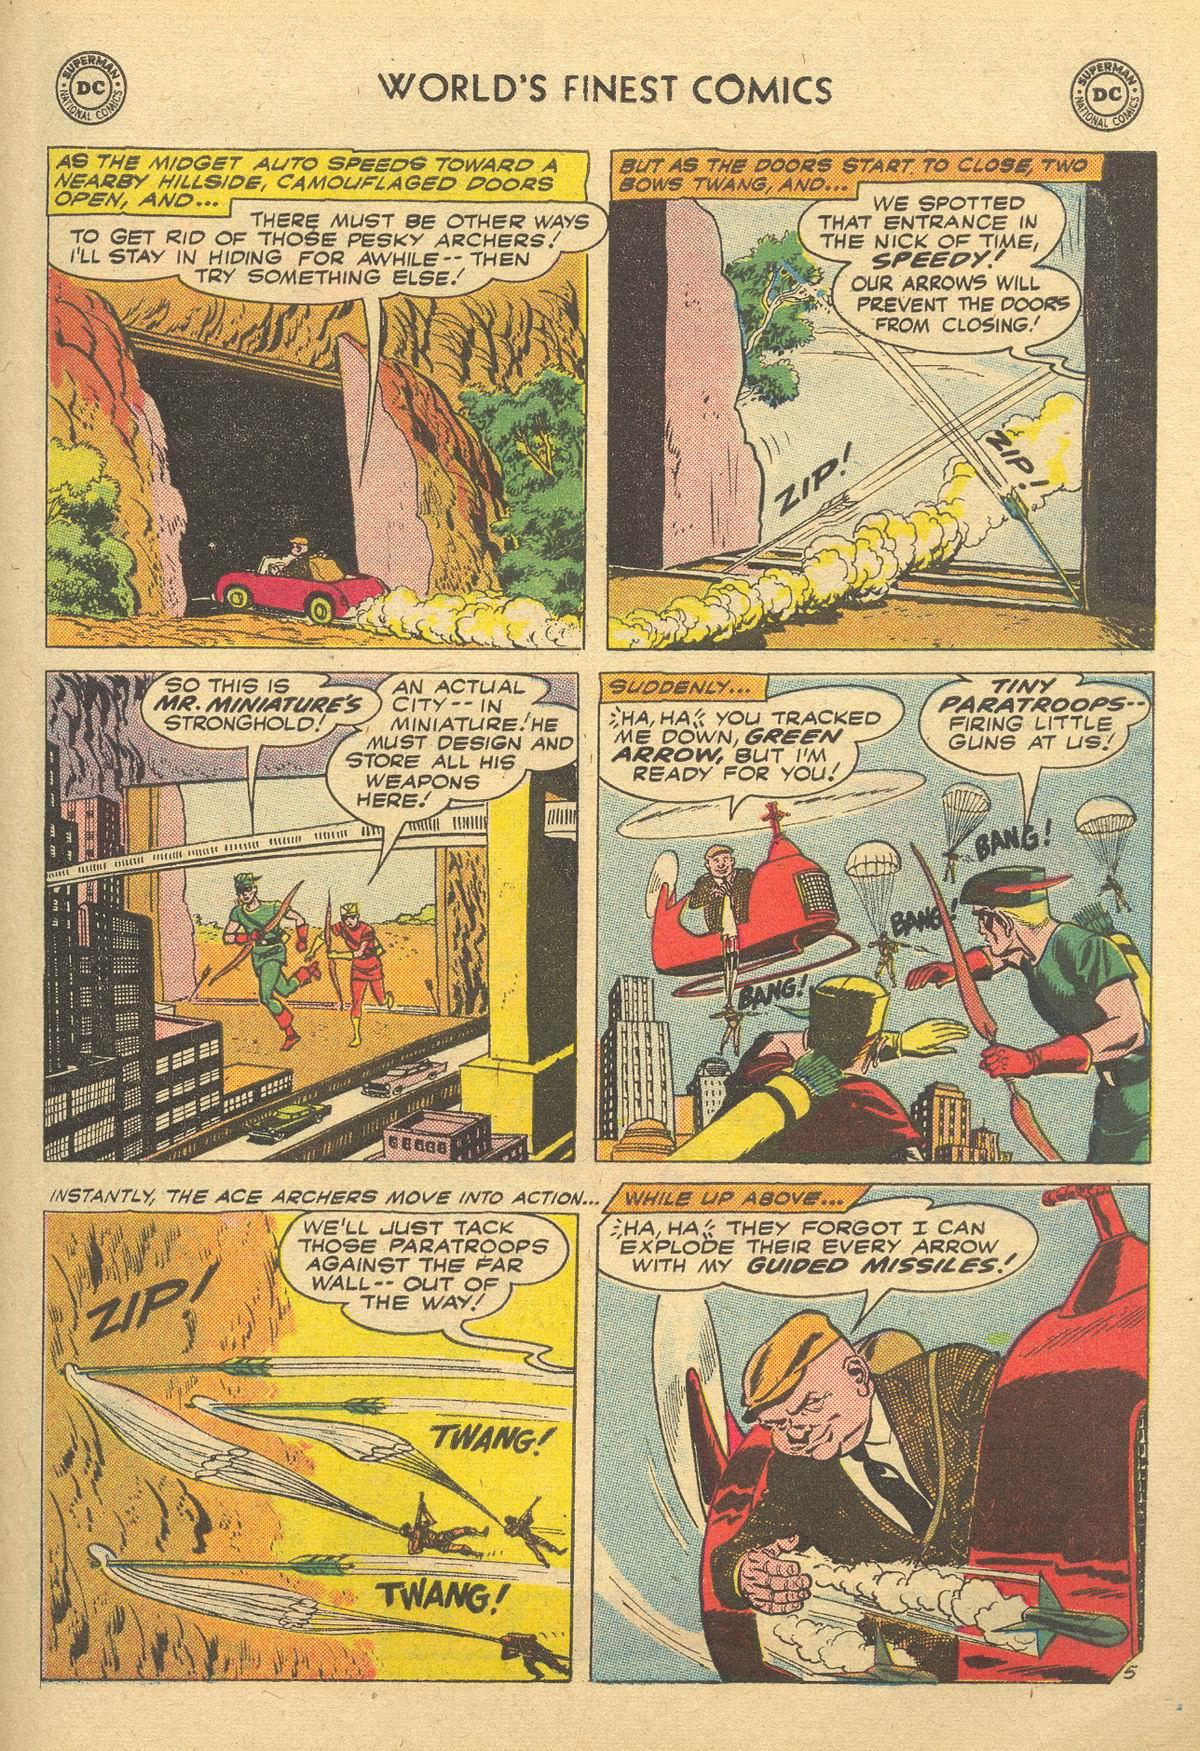 Read online World's Finest Comics comic -  Issue #105 - 31